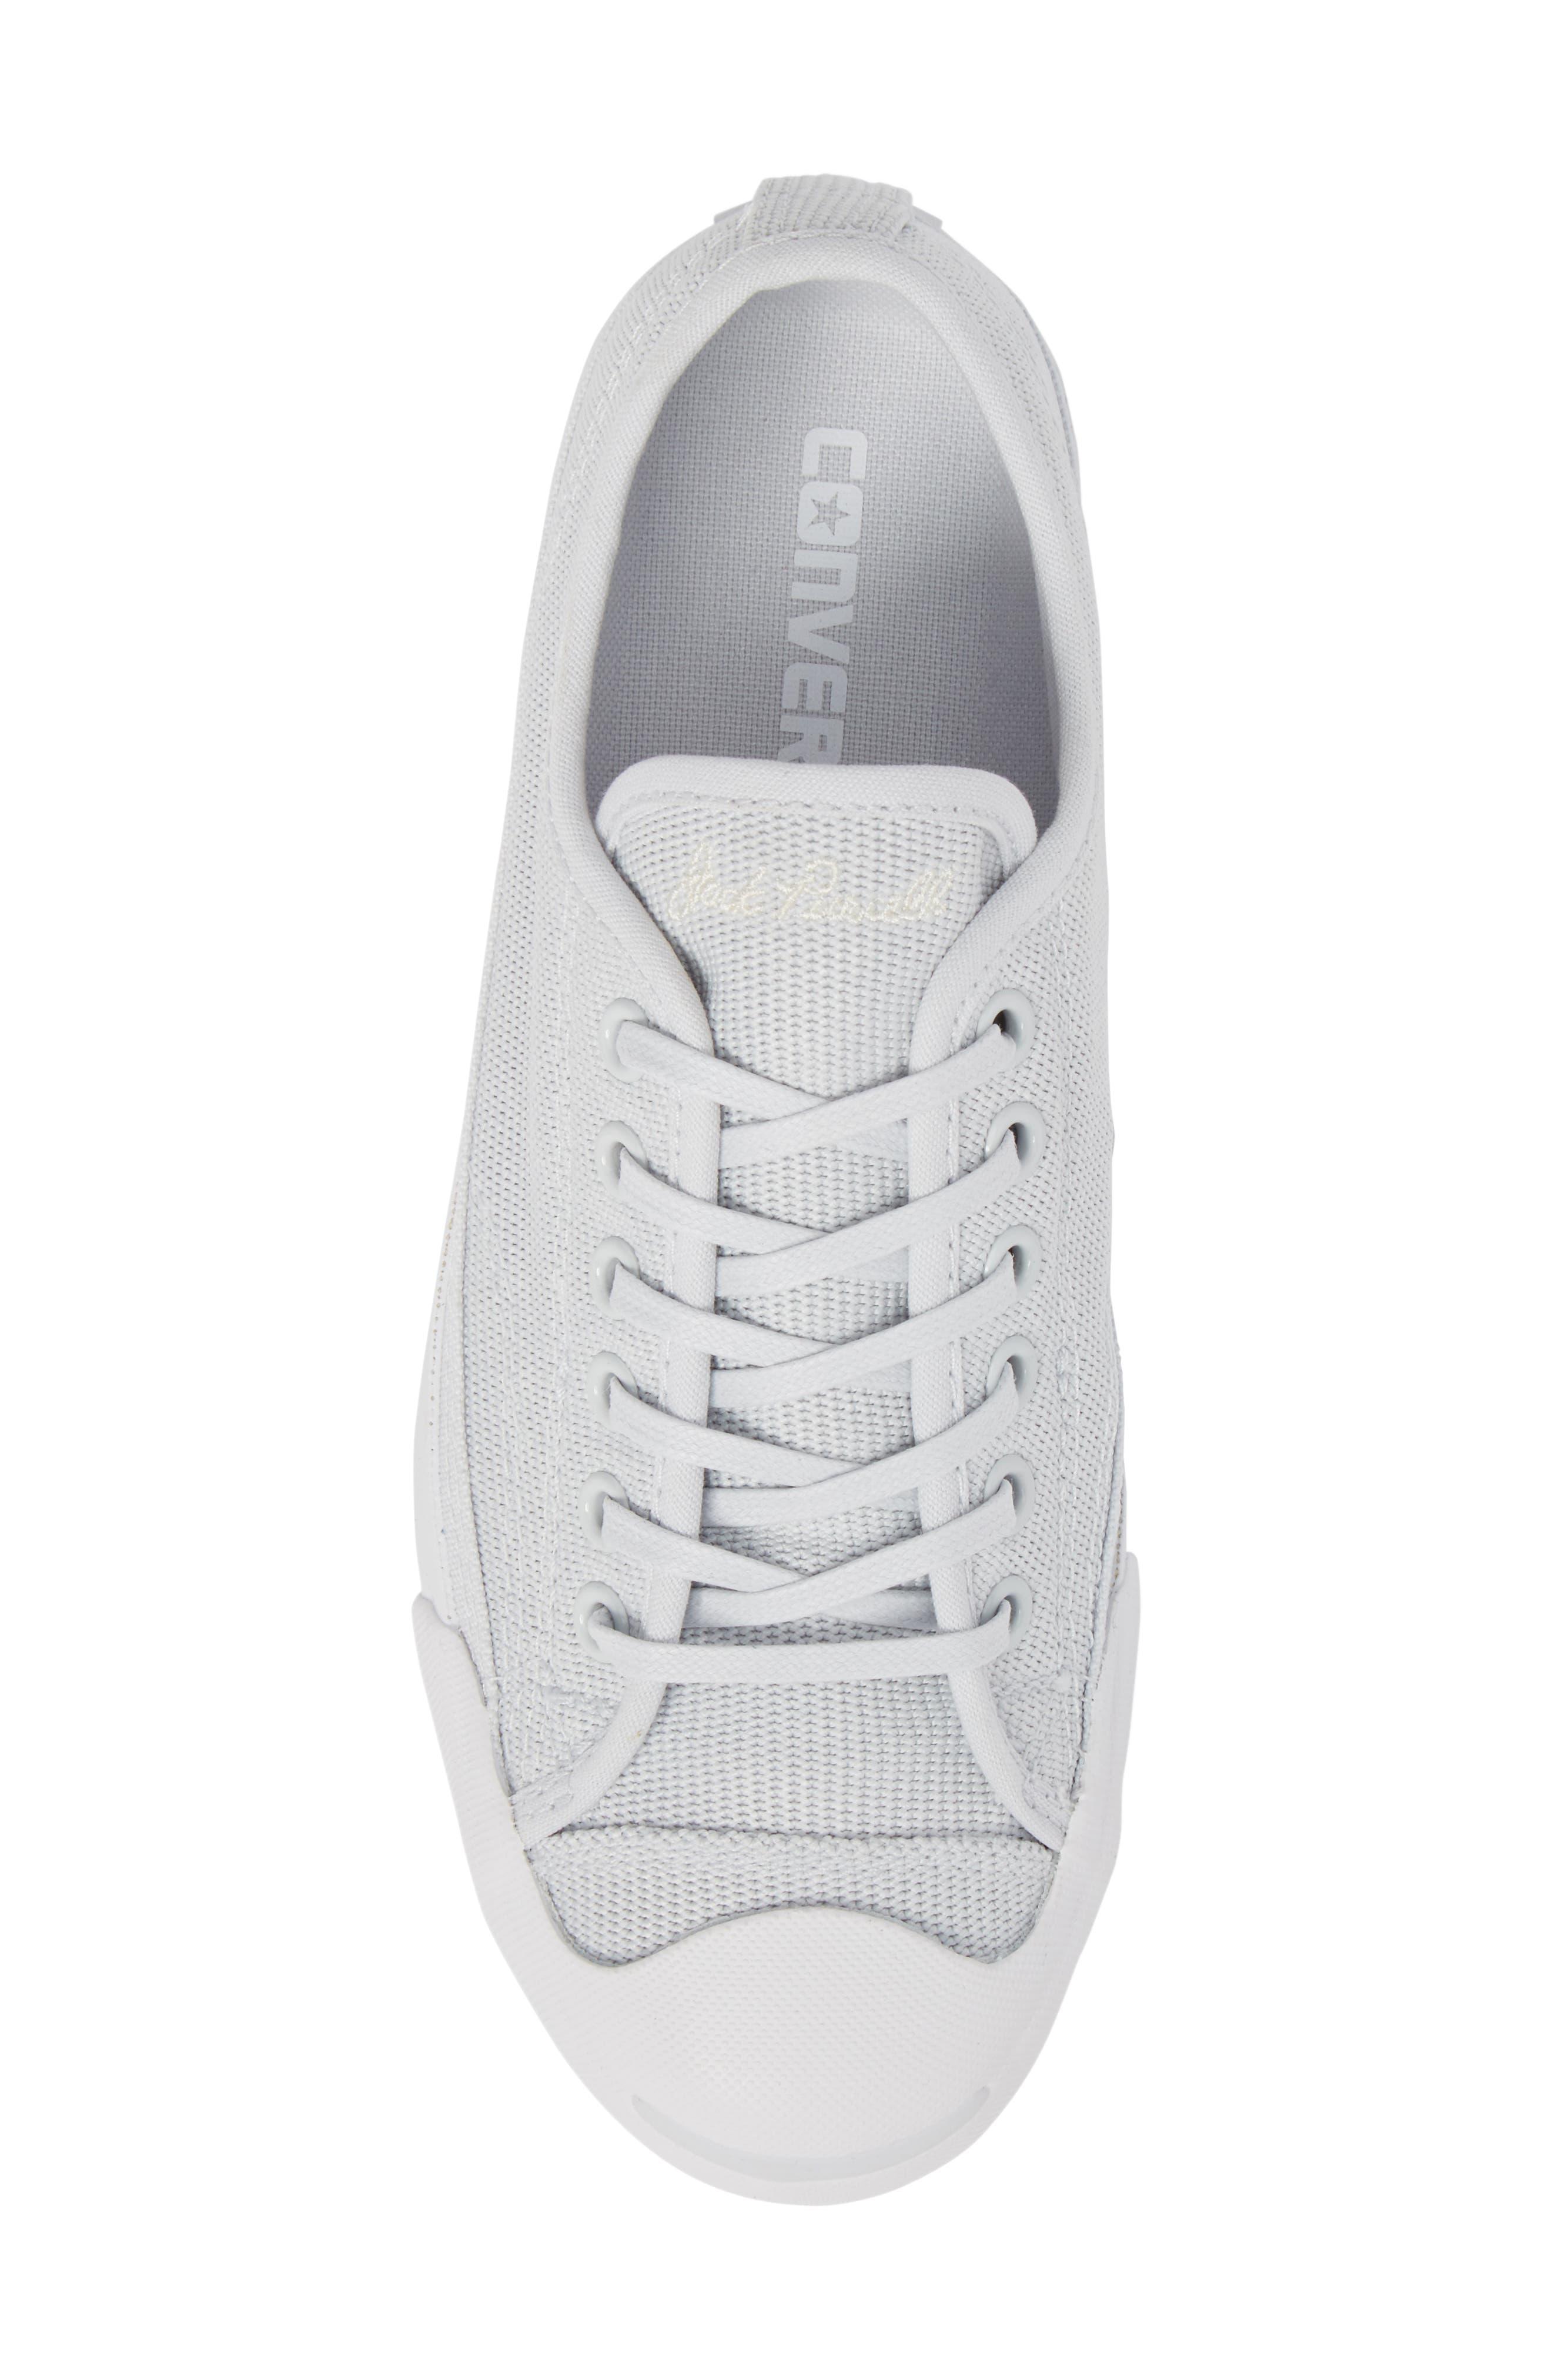 Jack Purcell Low Top Sneaker,                             Alternate thumbnail 5, color,                             Pure Platinum